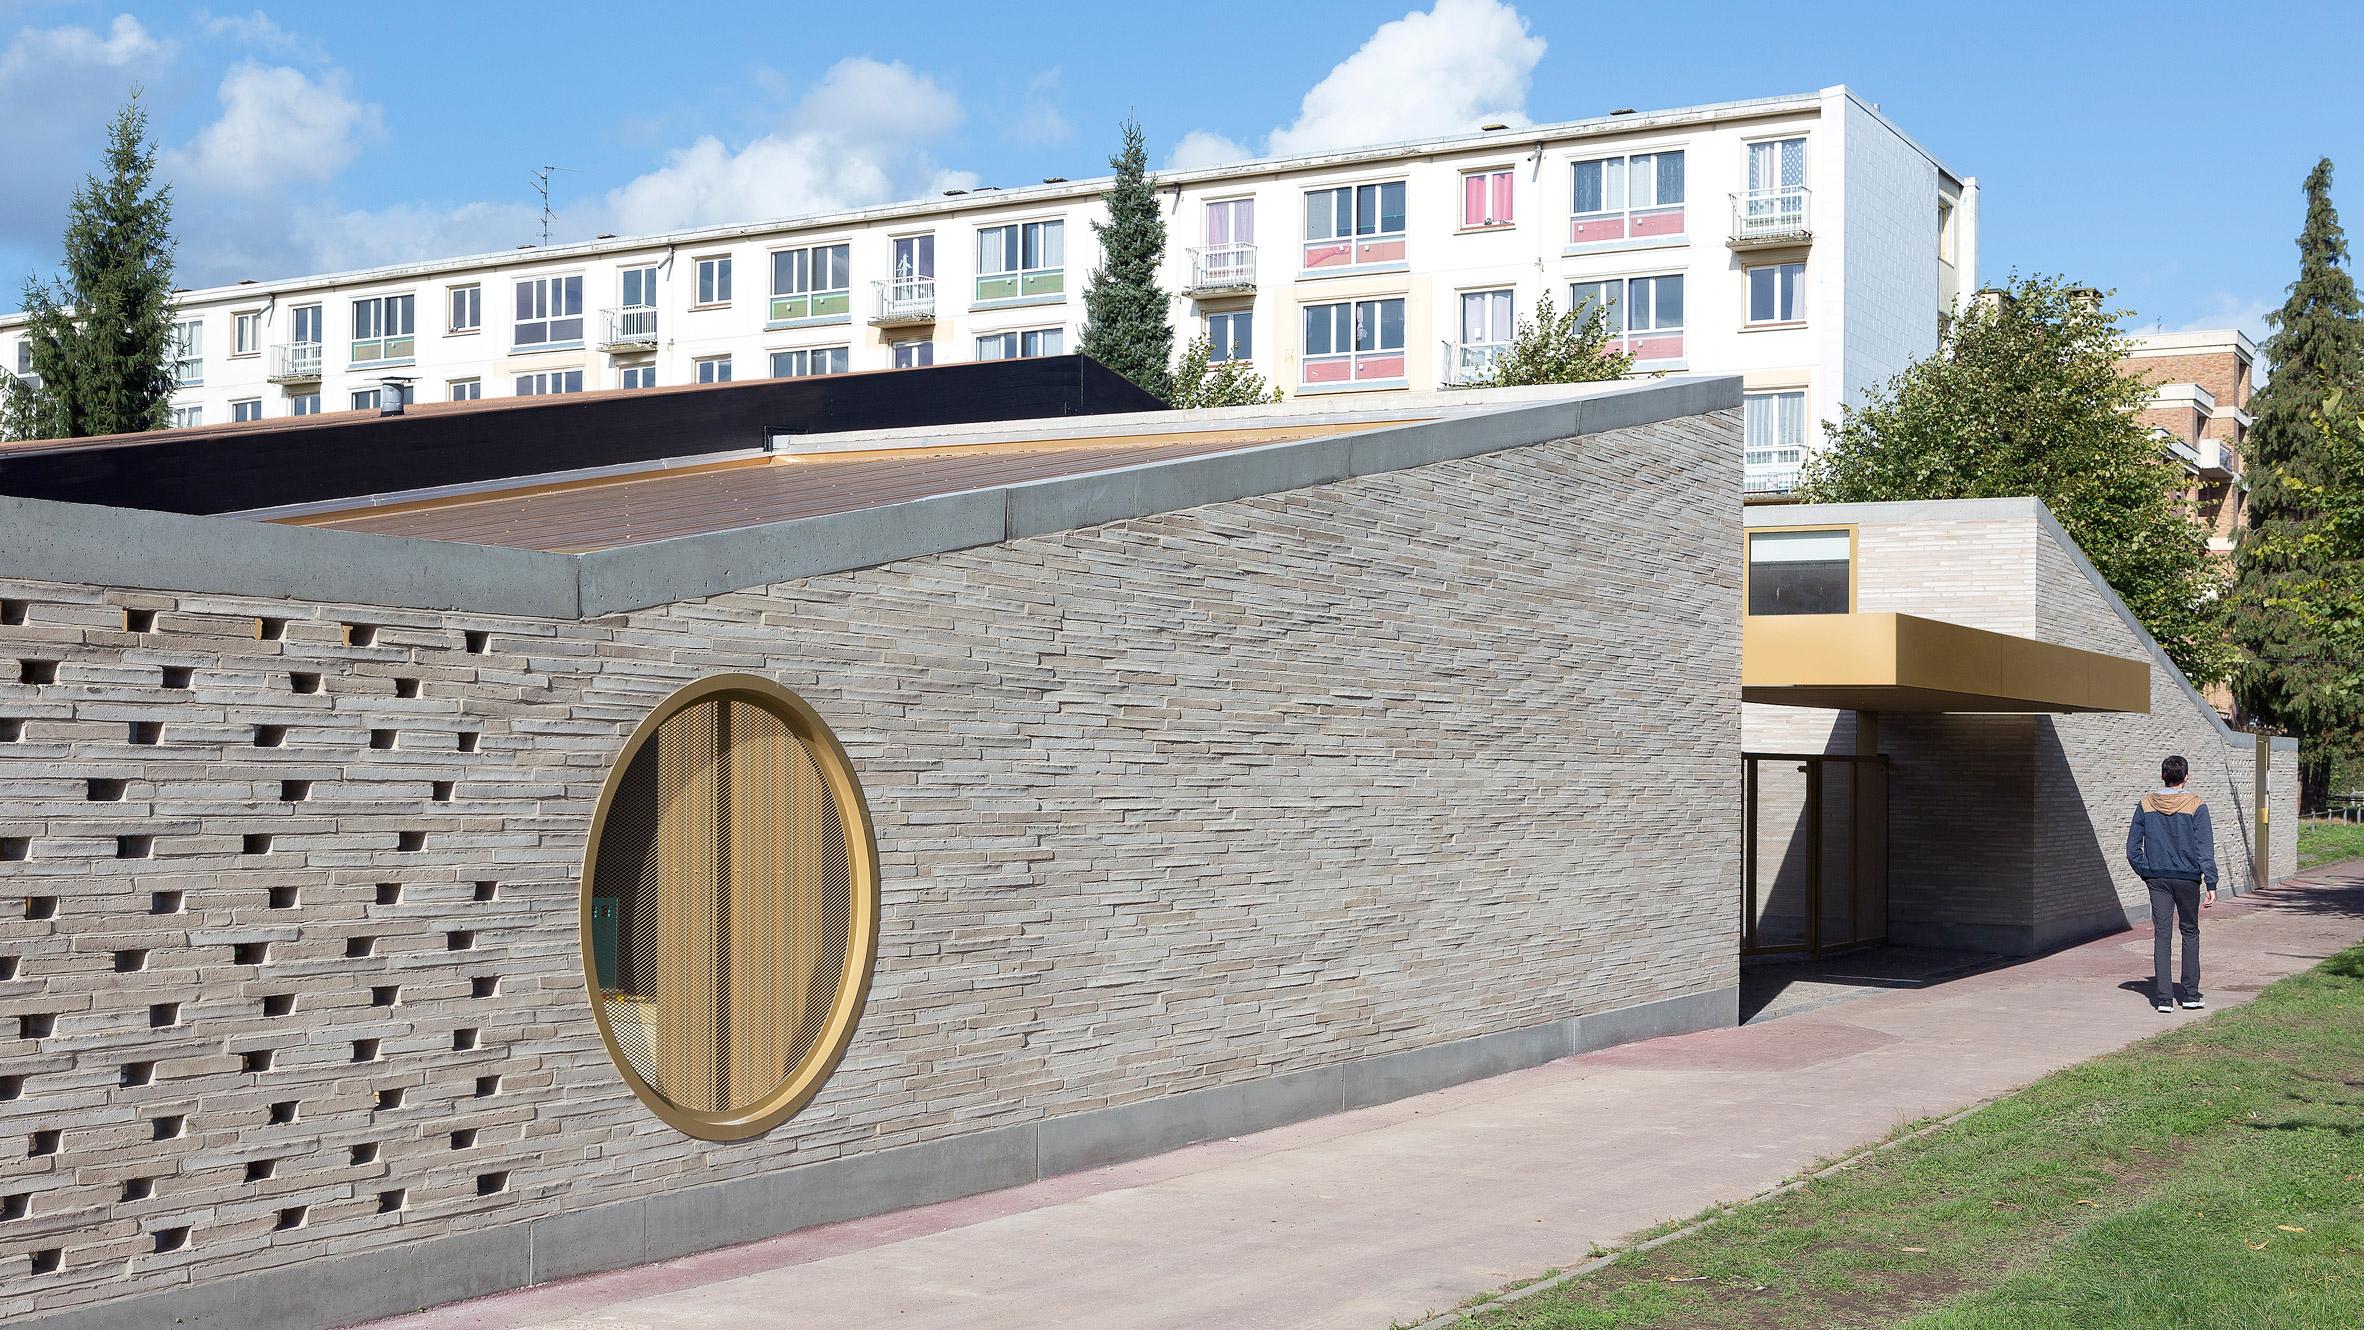 School Architecture And Design Dezeen - Schools architecture